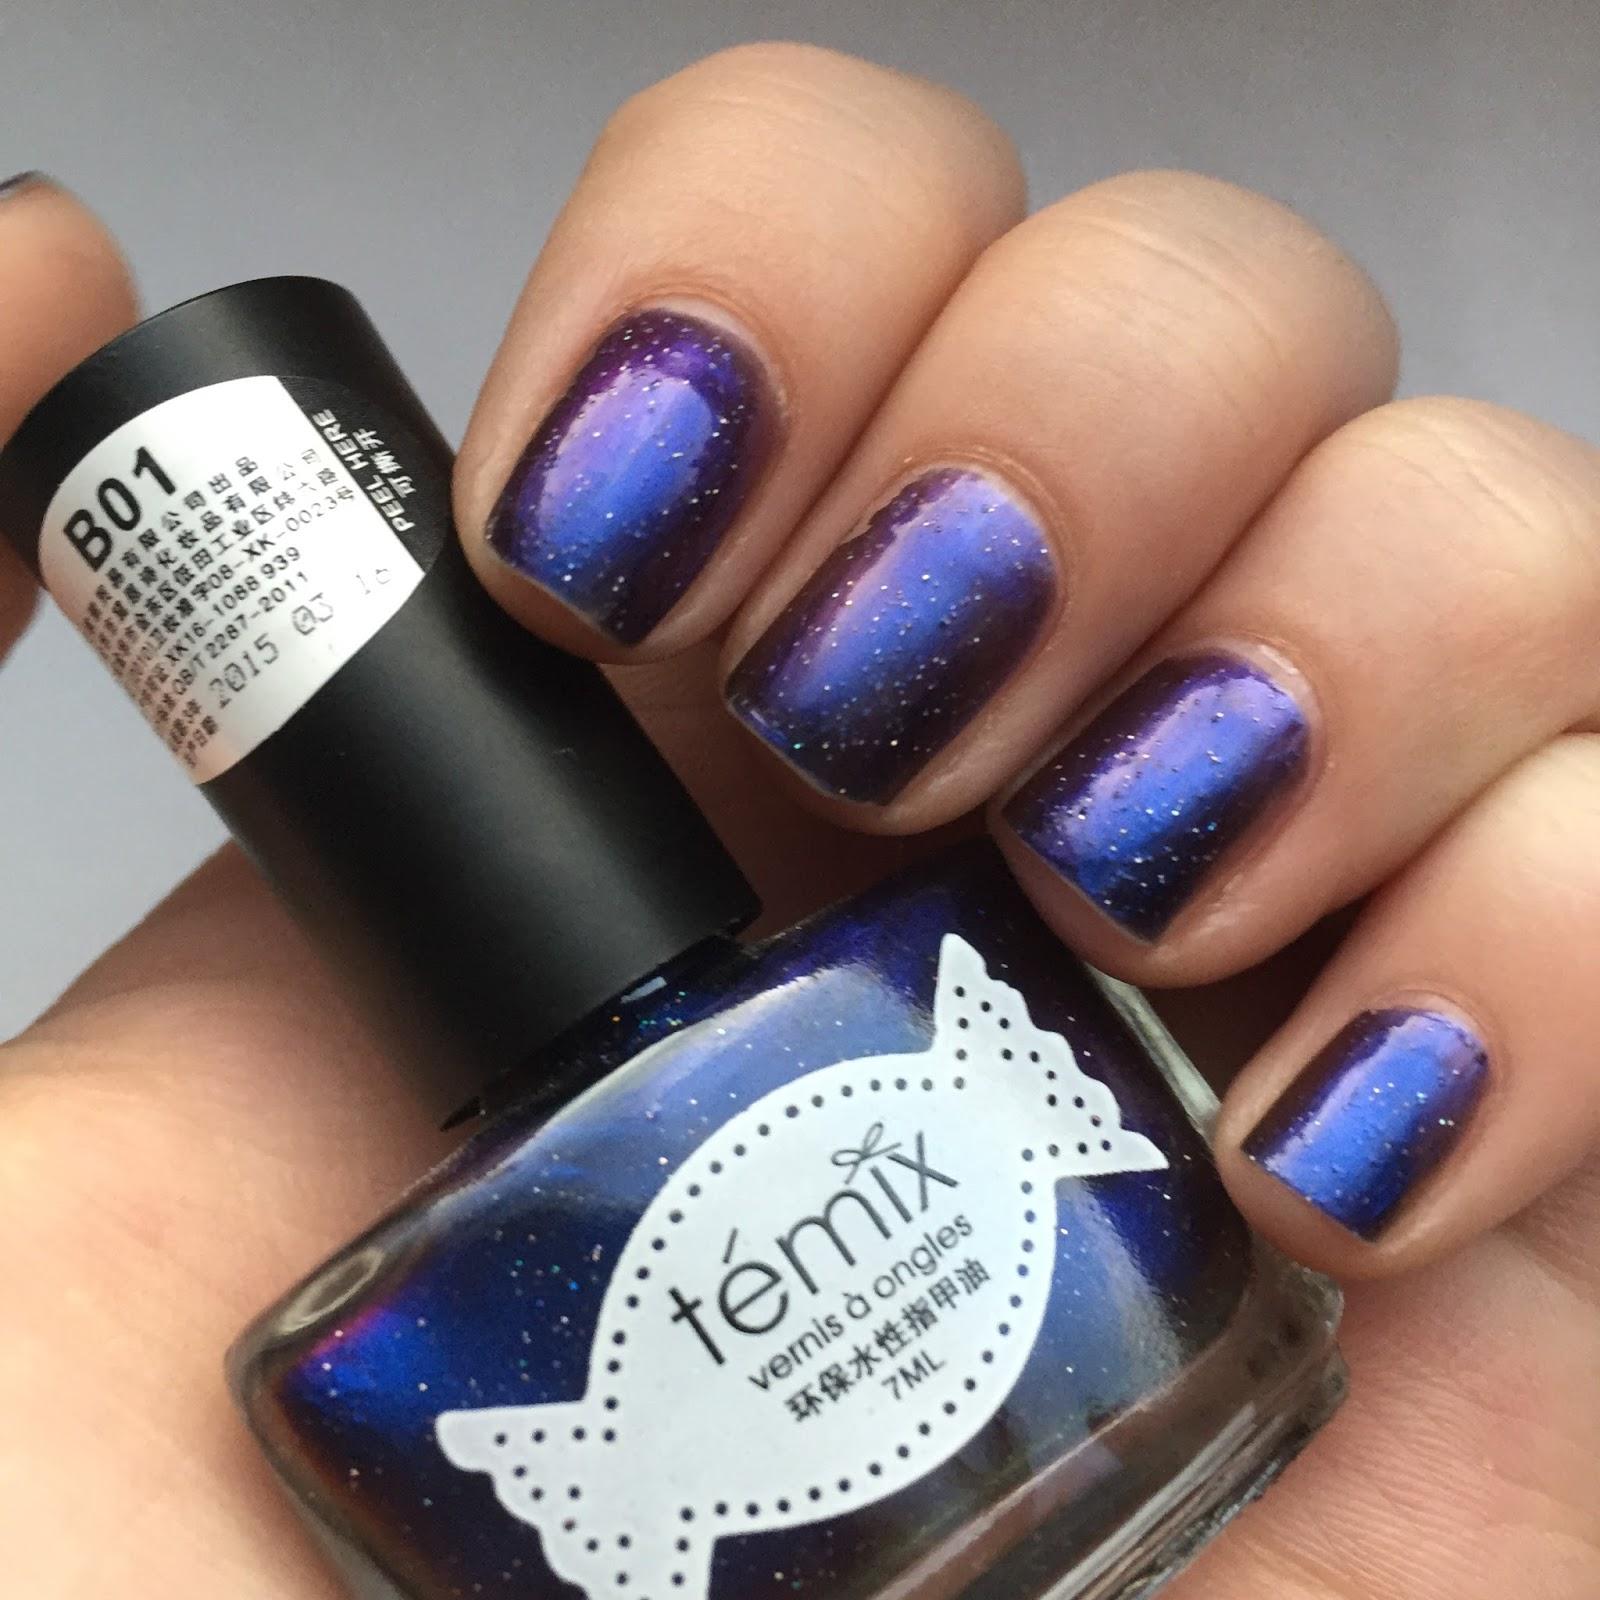 Jessis nails and more.. : Born Pretty Store- Rewievs & Erfahrungen